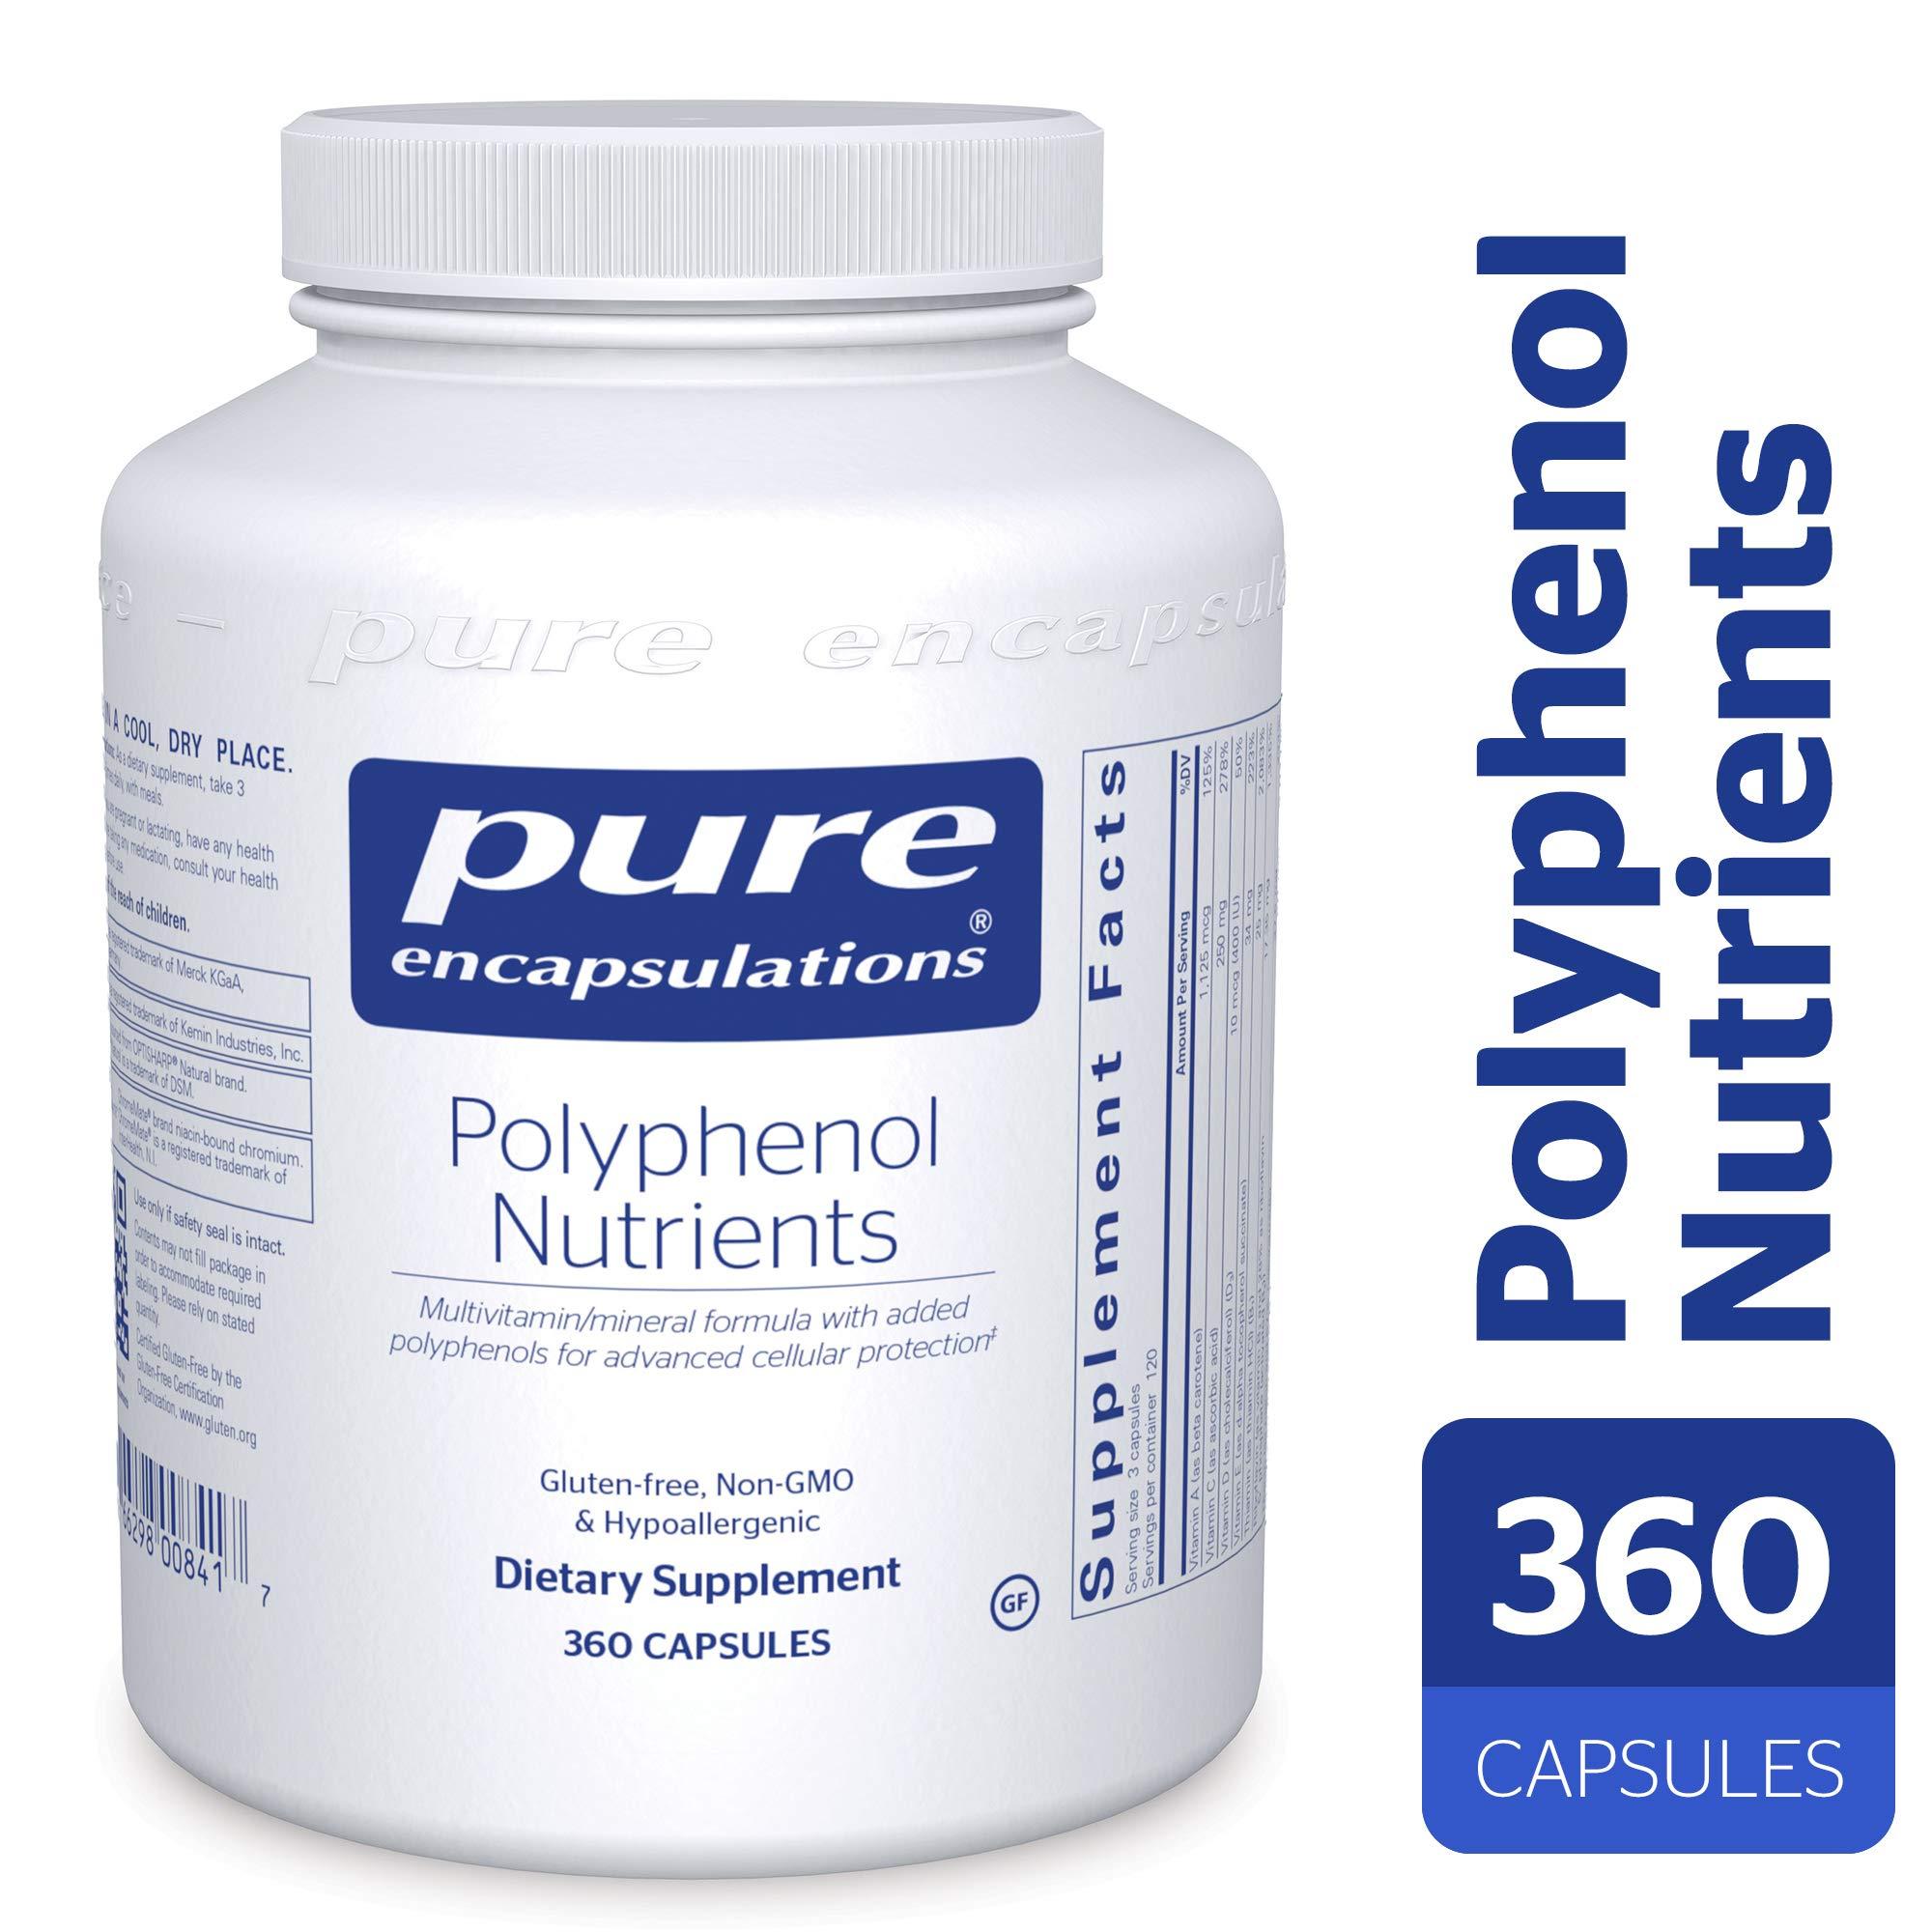 Pure Encapsulations - Polyphenol Nutrients - Hypoallergenic Nutrient Dense Multivitamin/Mineral Formula - 360 Capsules by Pure Encapsulations